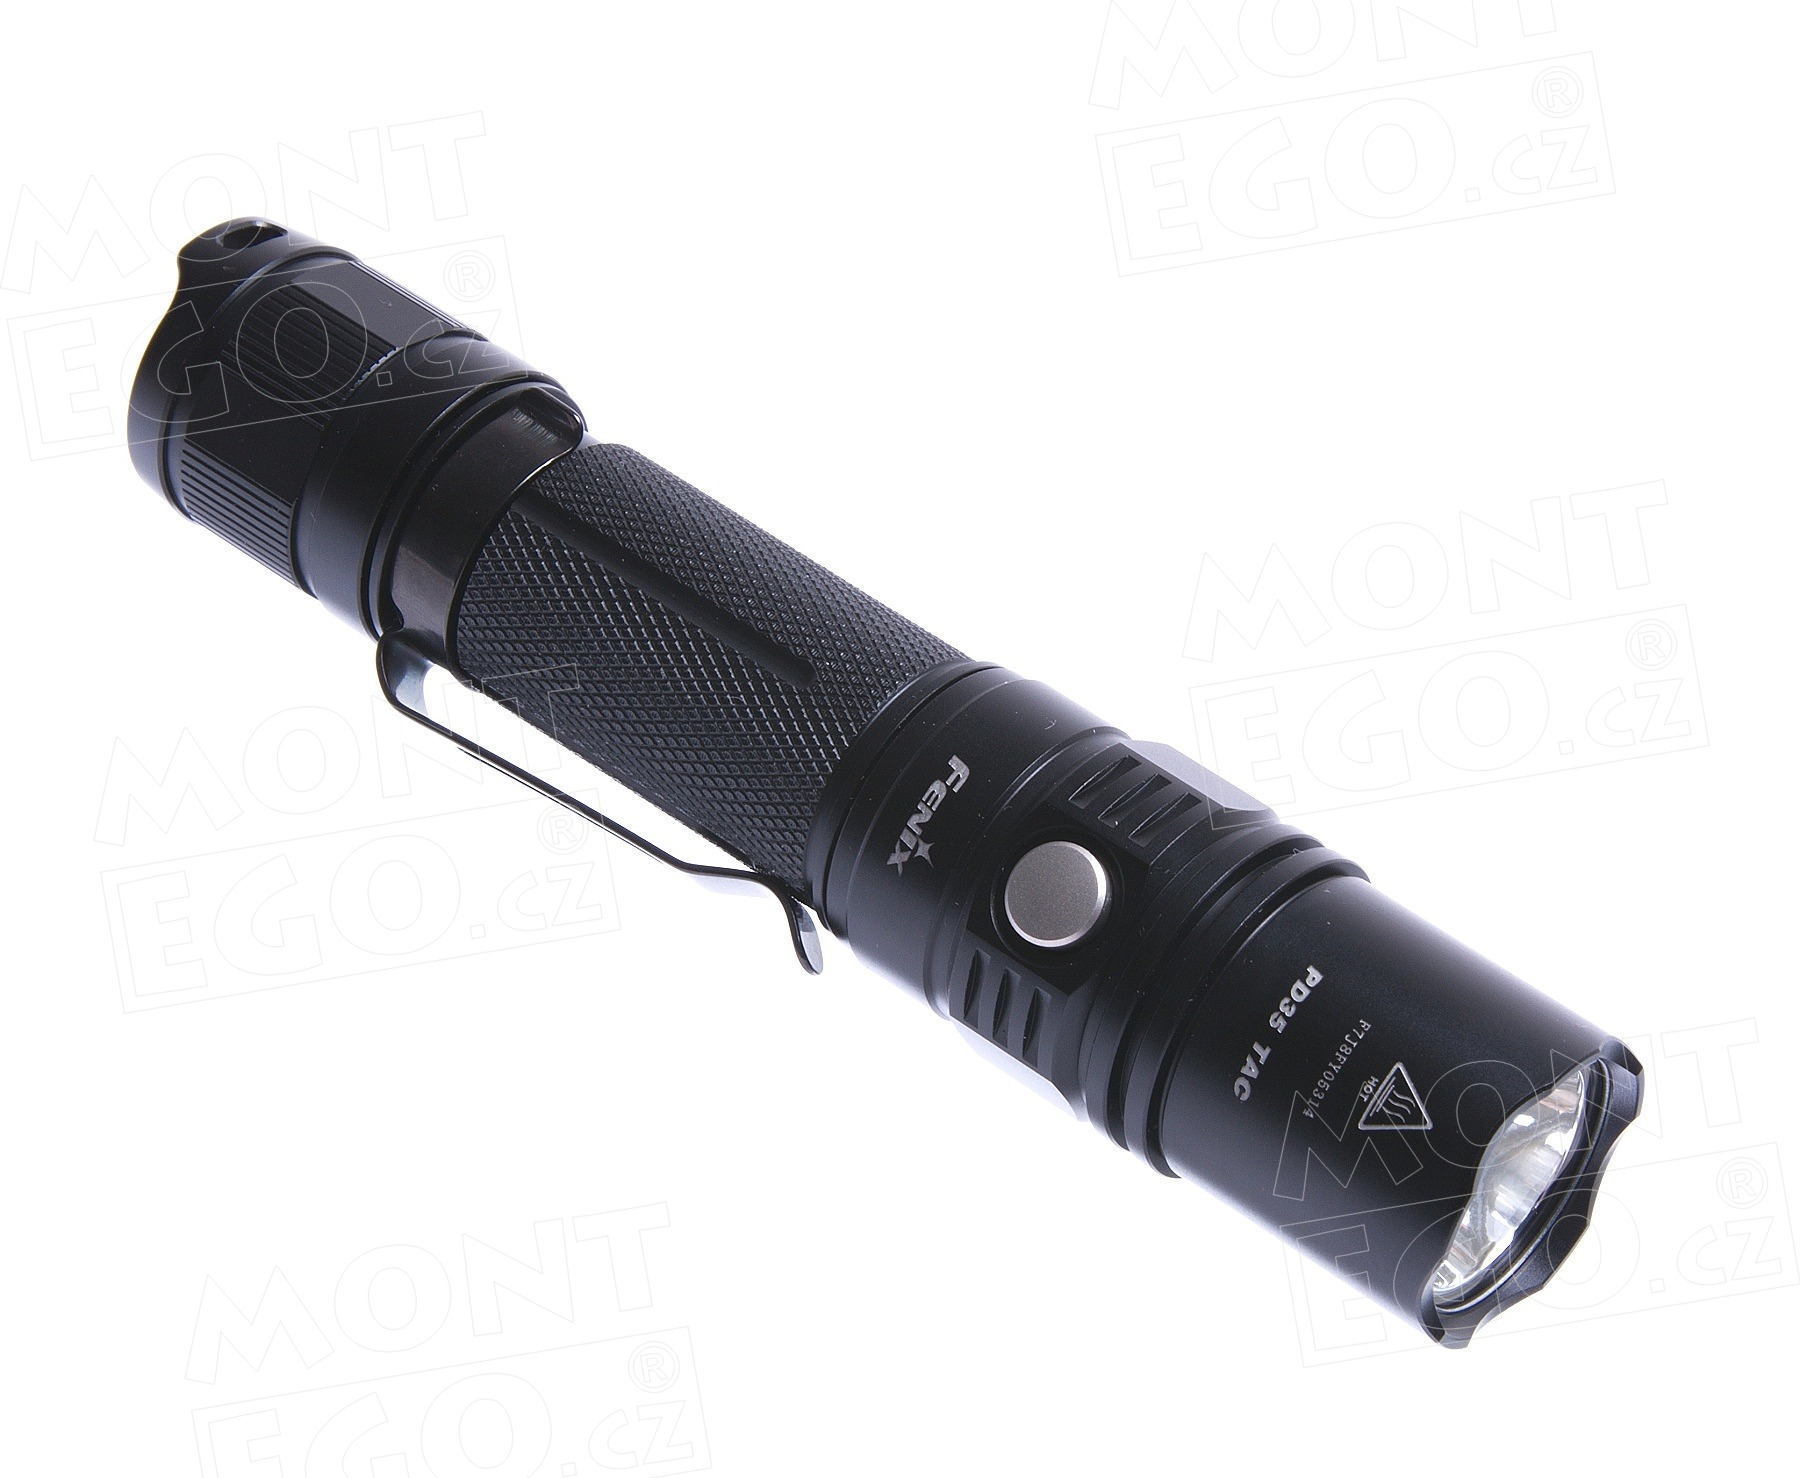 Led svítilna Fenix PD35 TAC, taktická baterka s 1000 lumeny